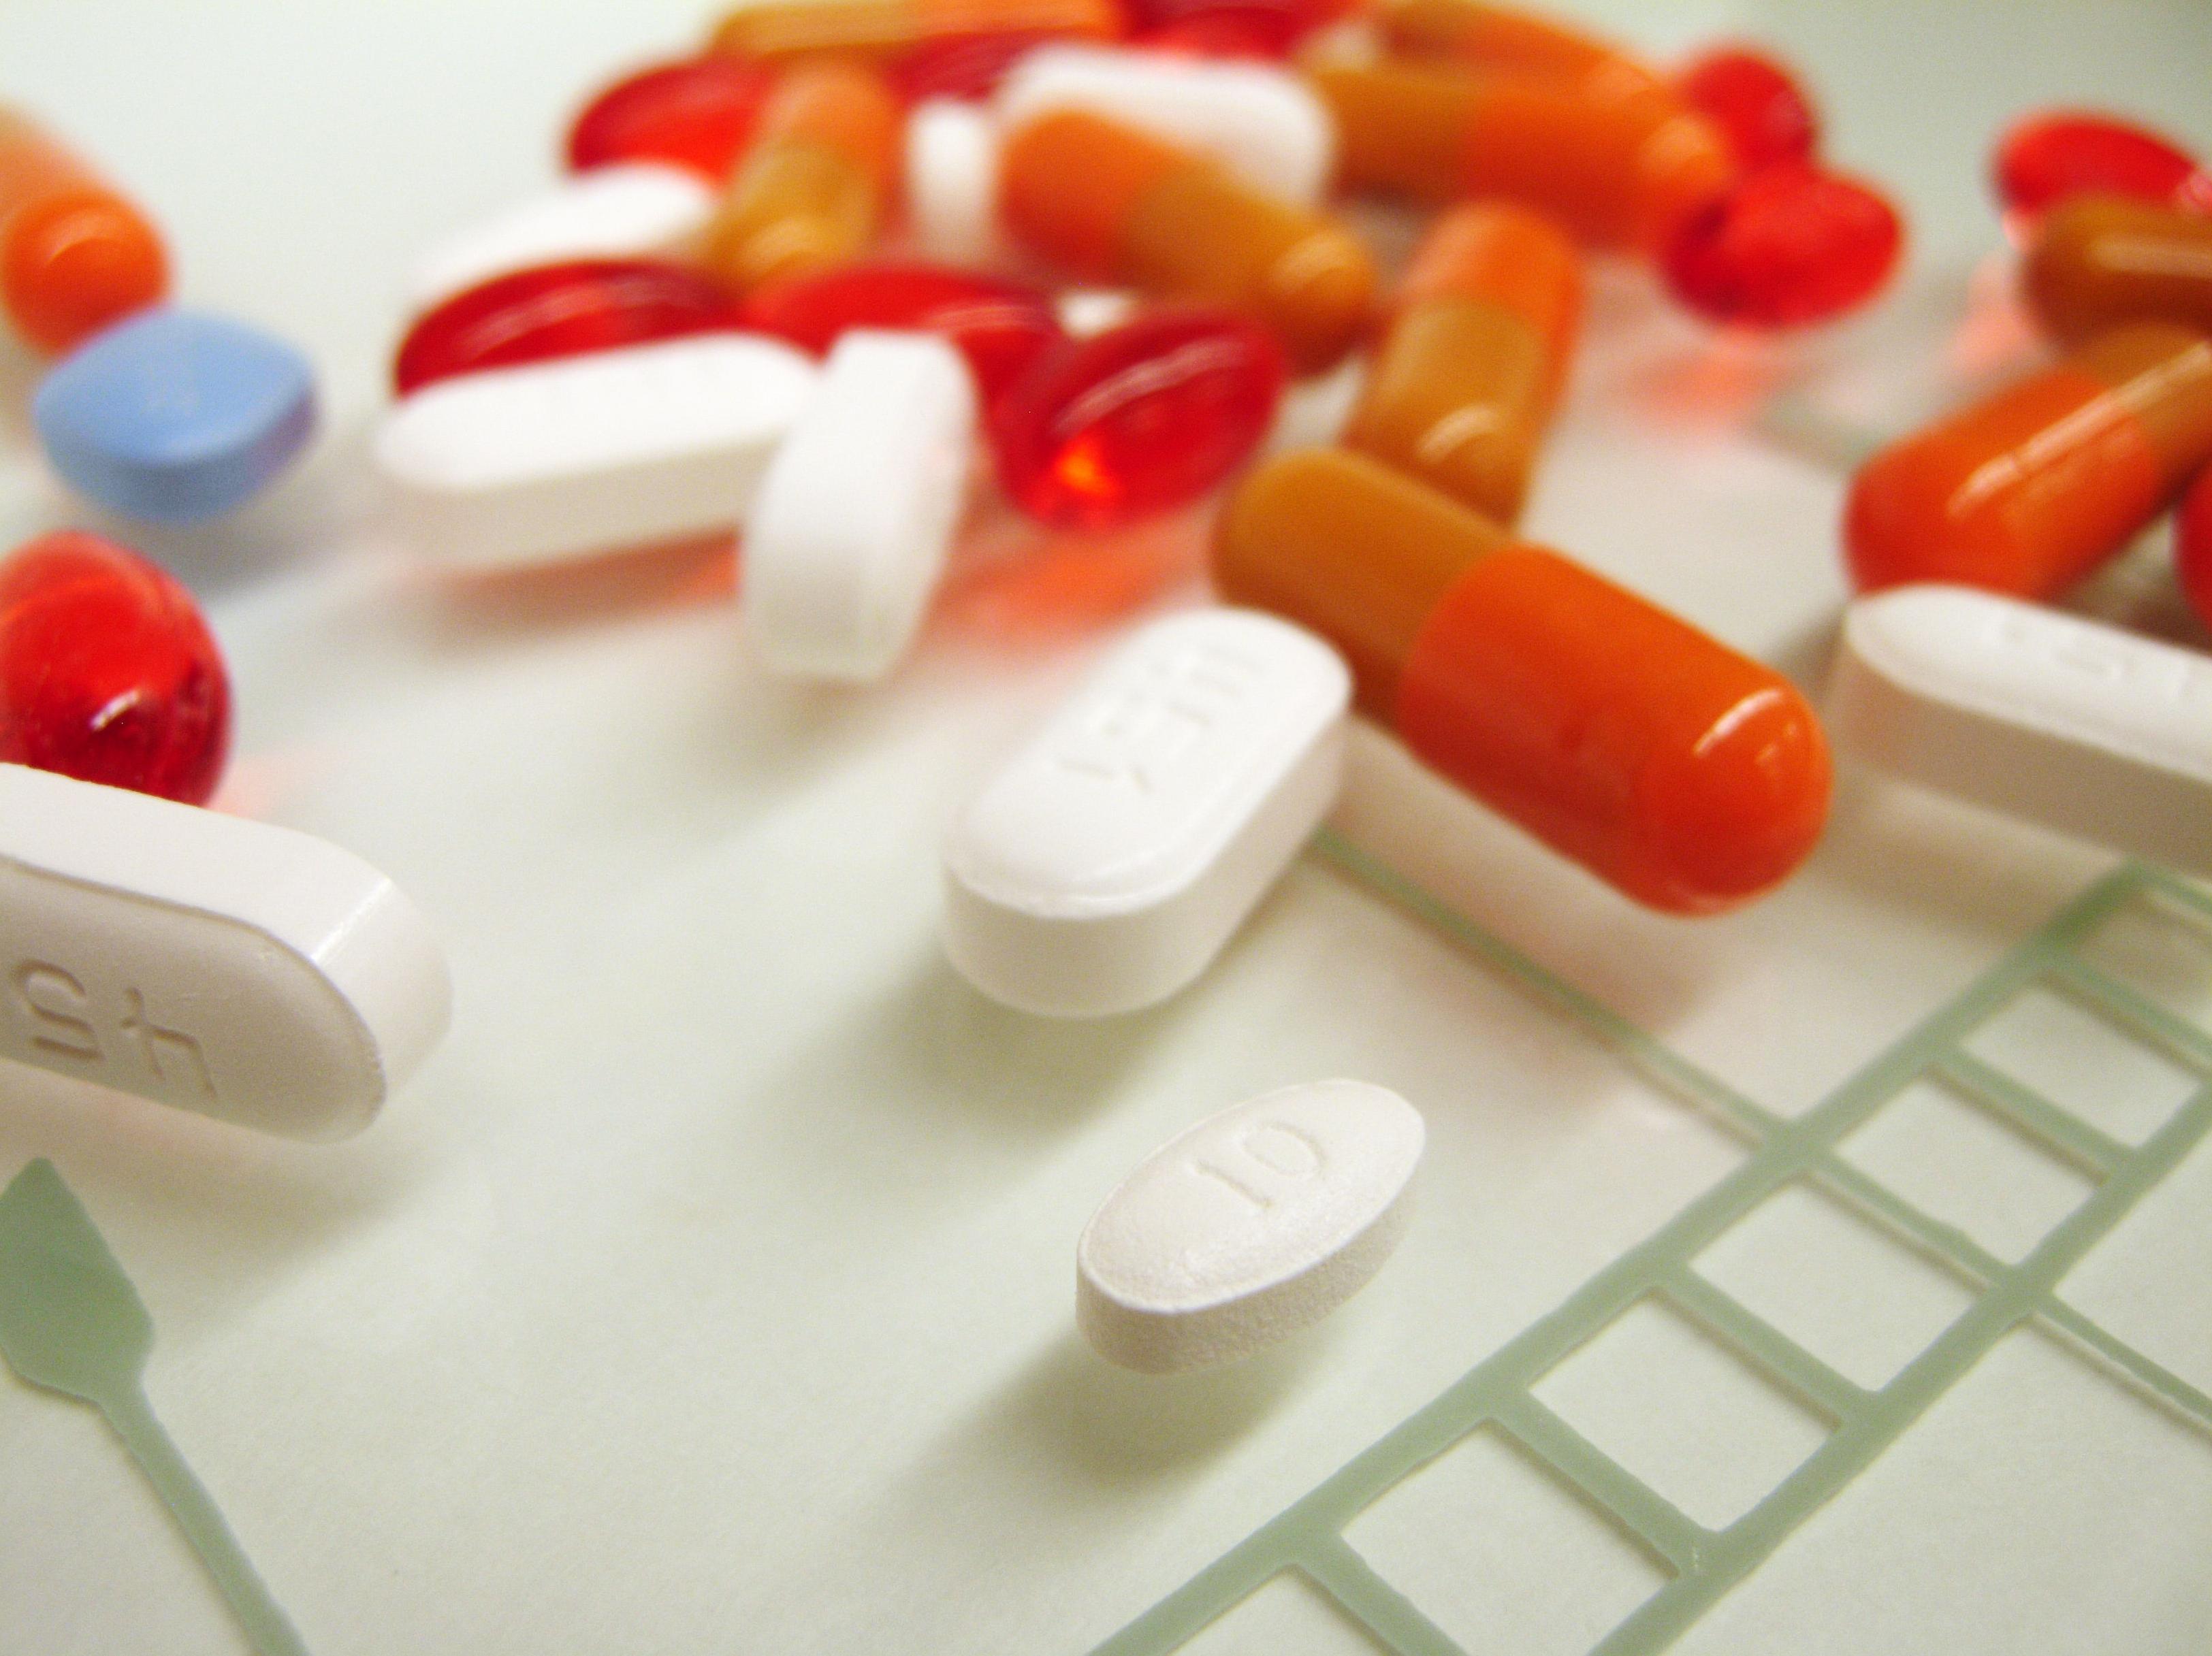 Farmacia Internacional Estepona Centro \u002D Dermofarmacia